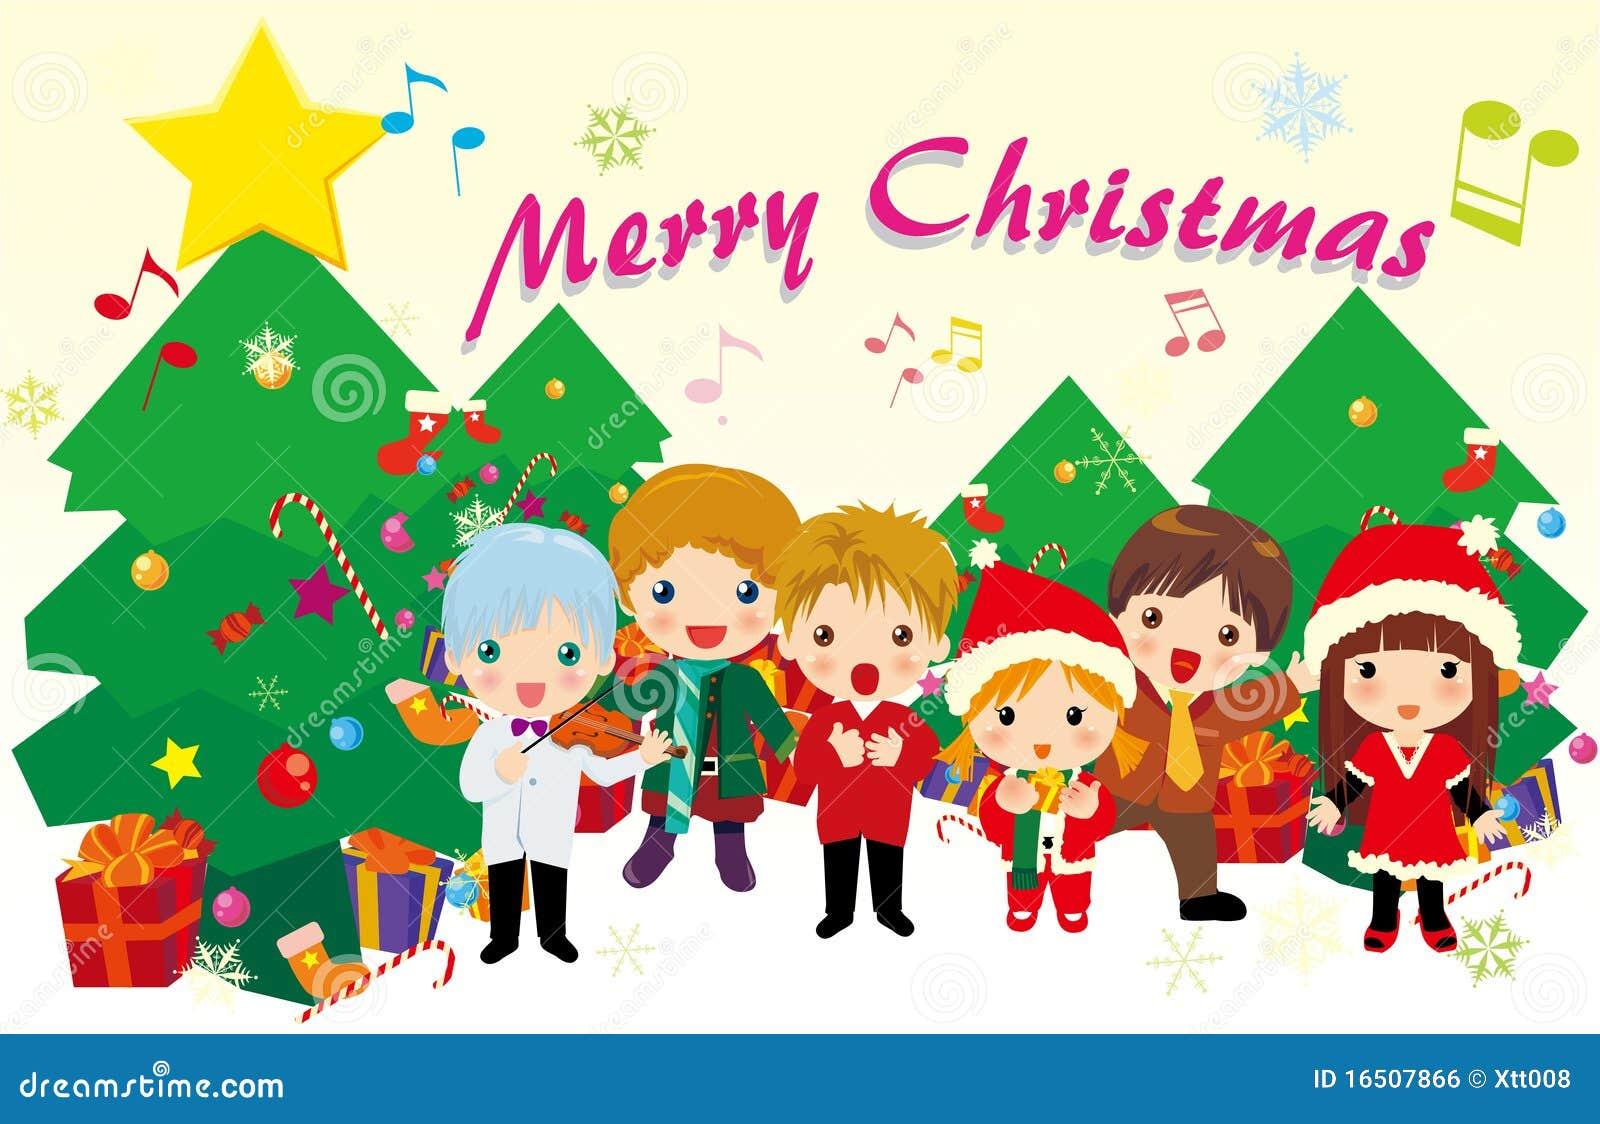 Kid Songs Christmas Concert